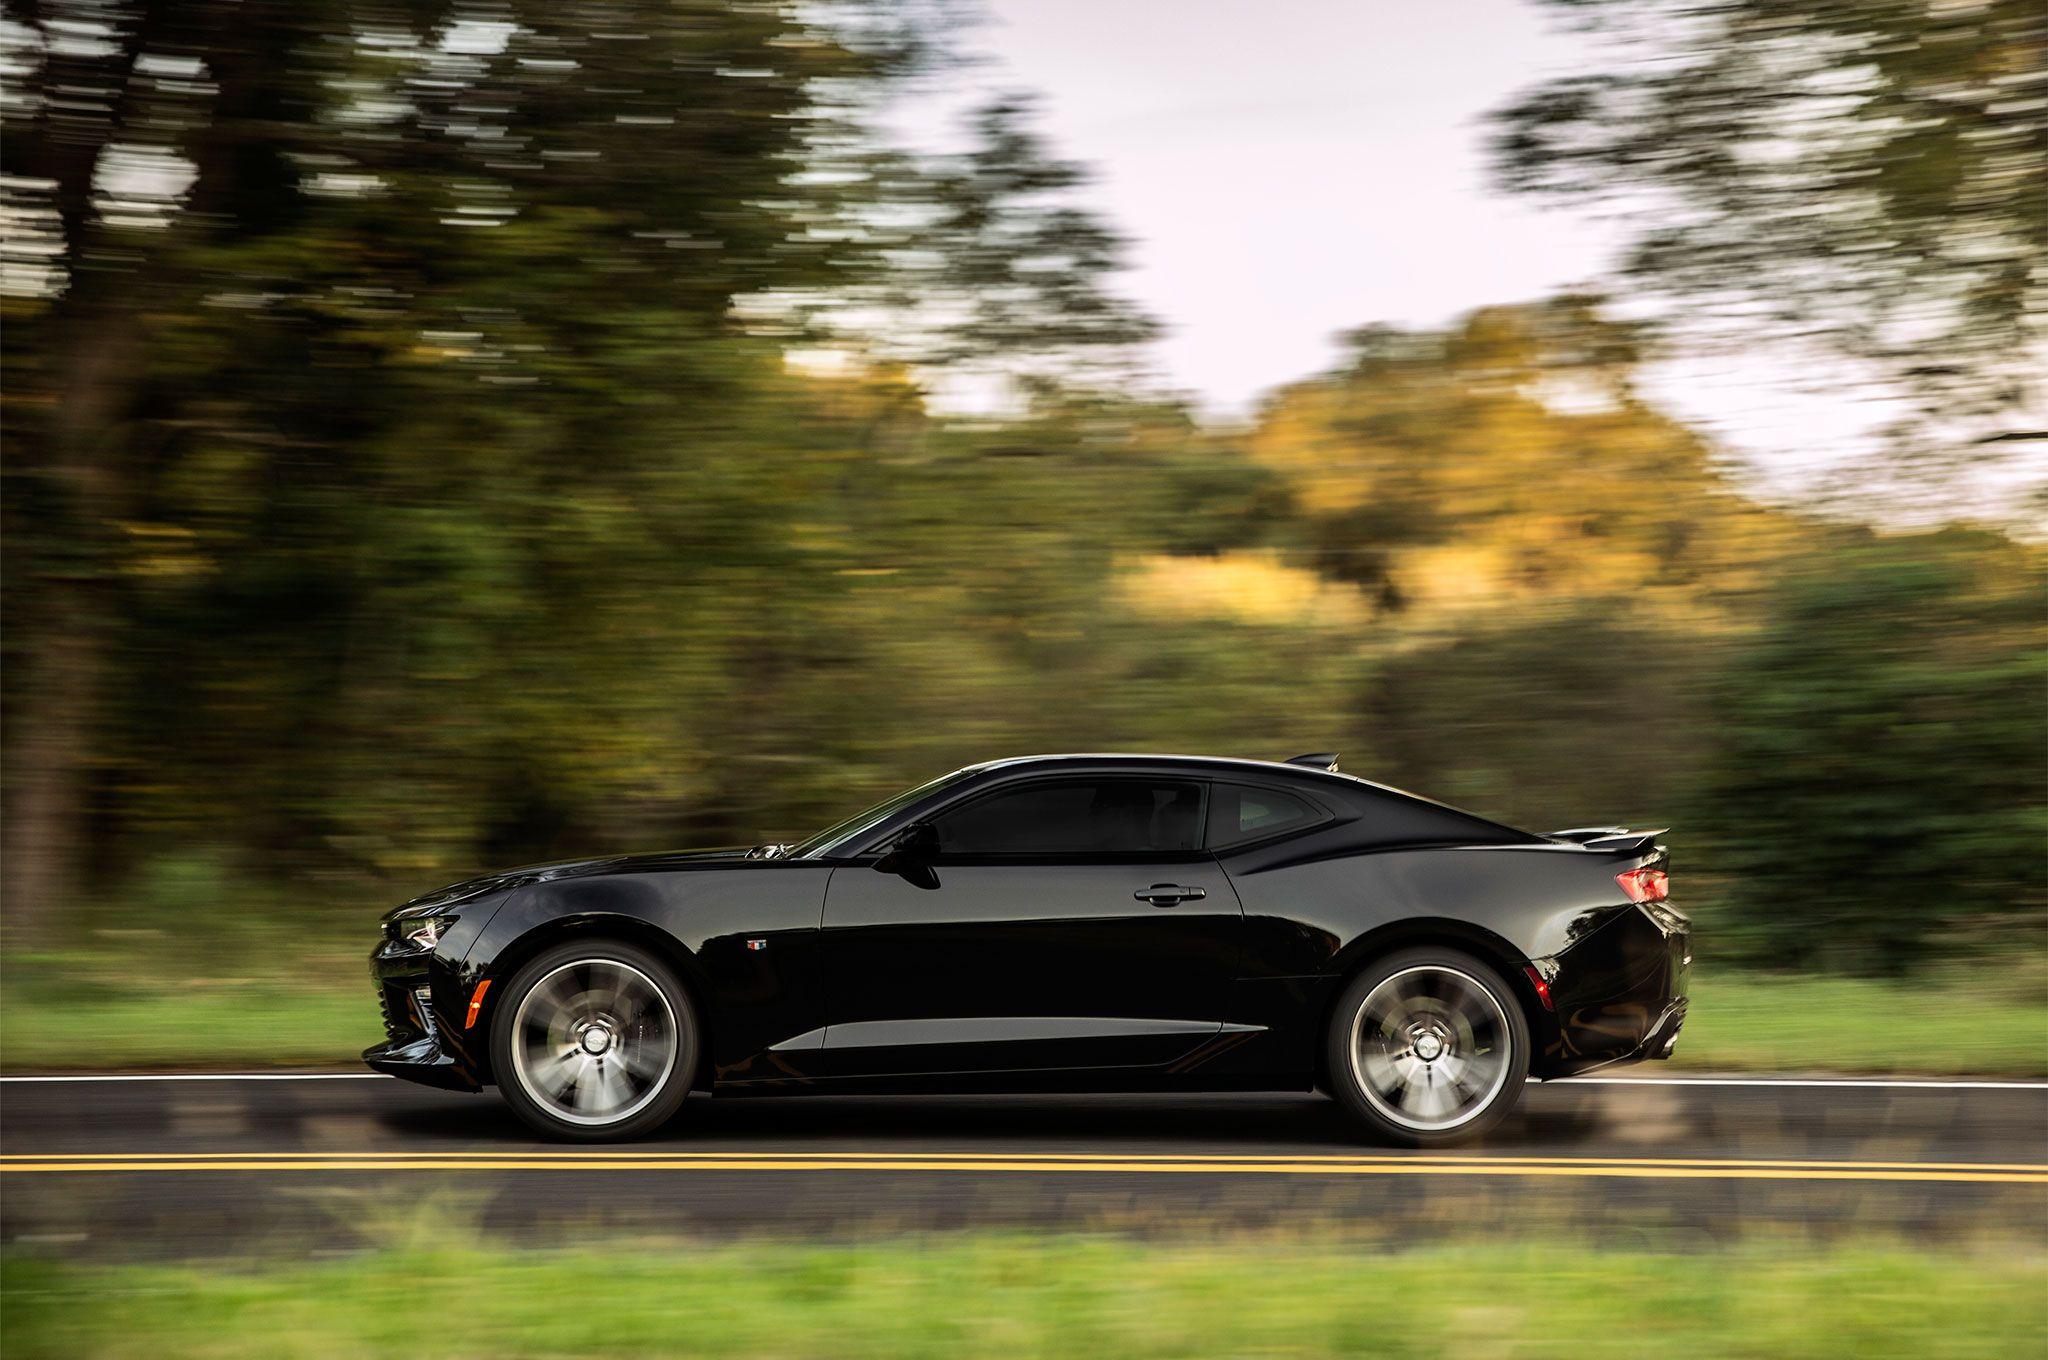 2016 Camaro SS First Drive 2048x1360